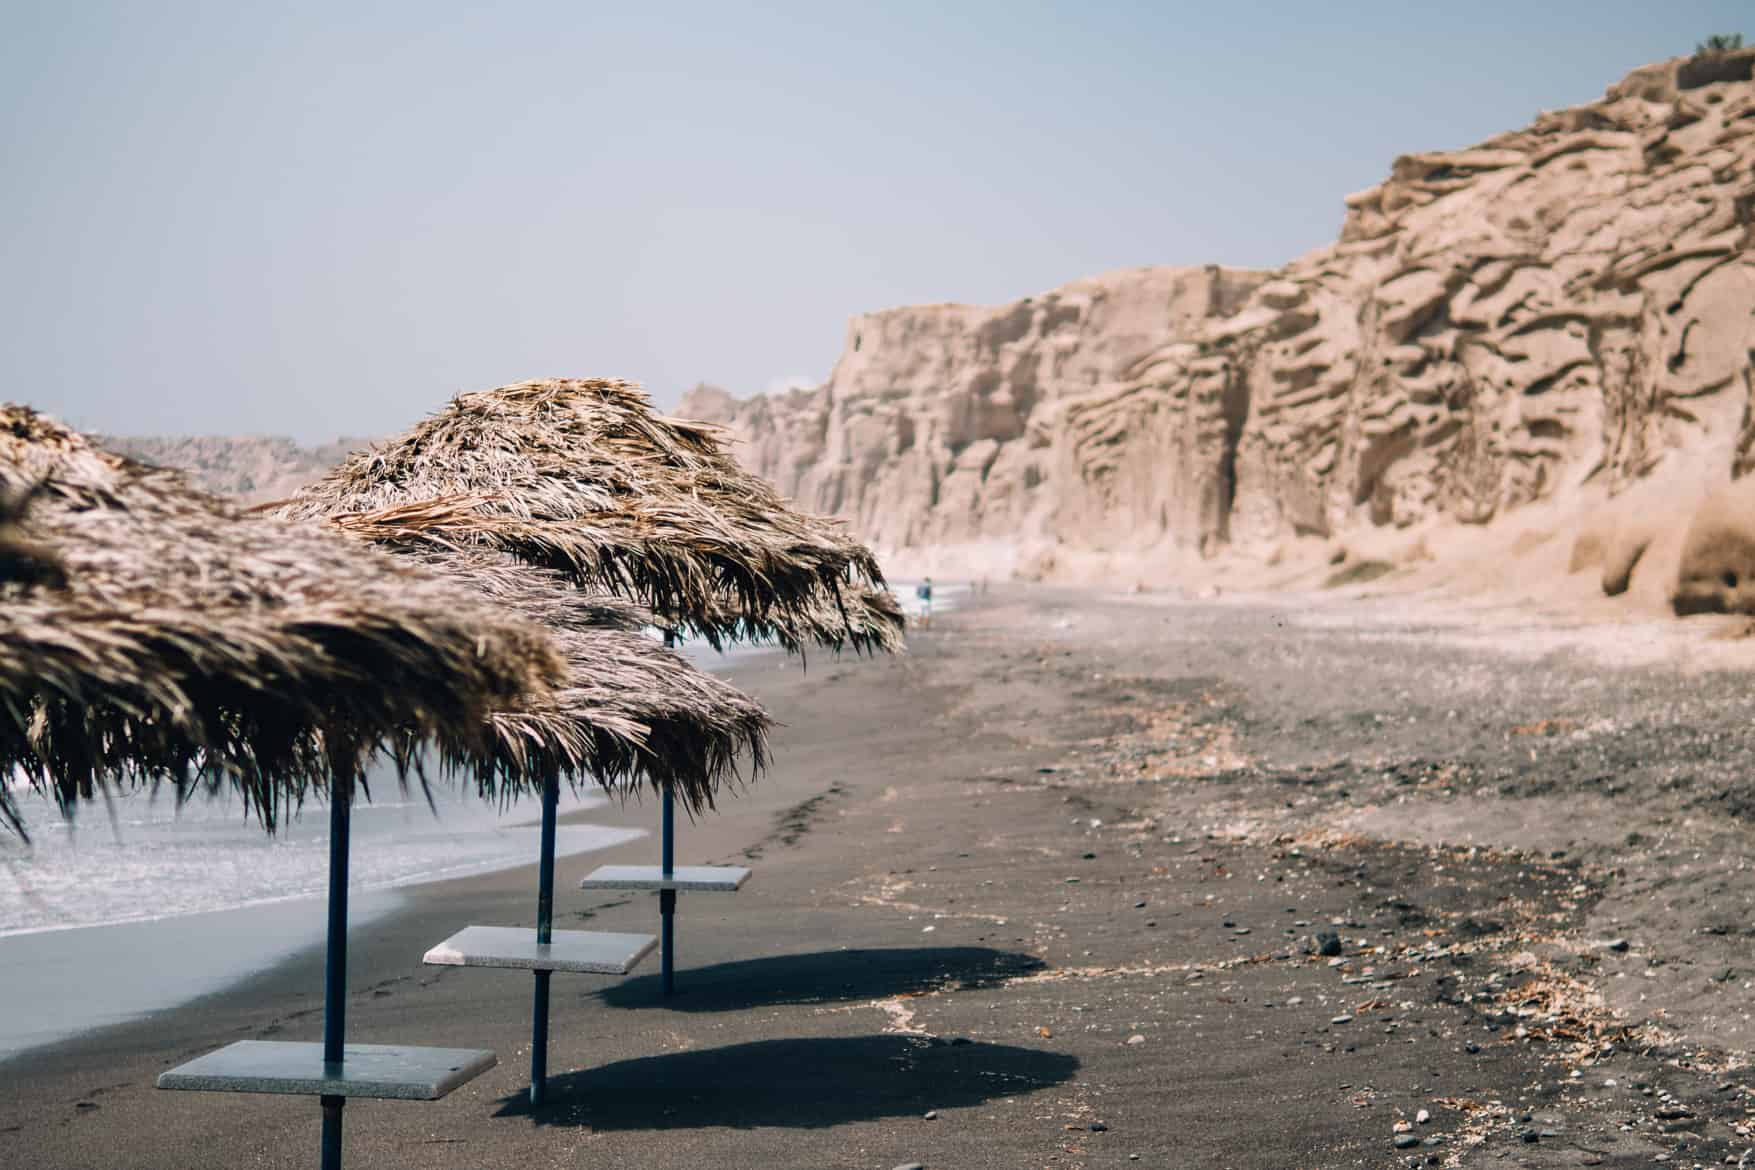 Santorini Travel Guide: Der ruhige Vlychada Beach